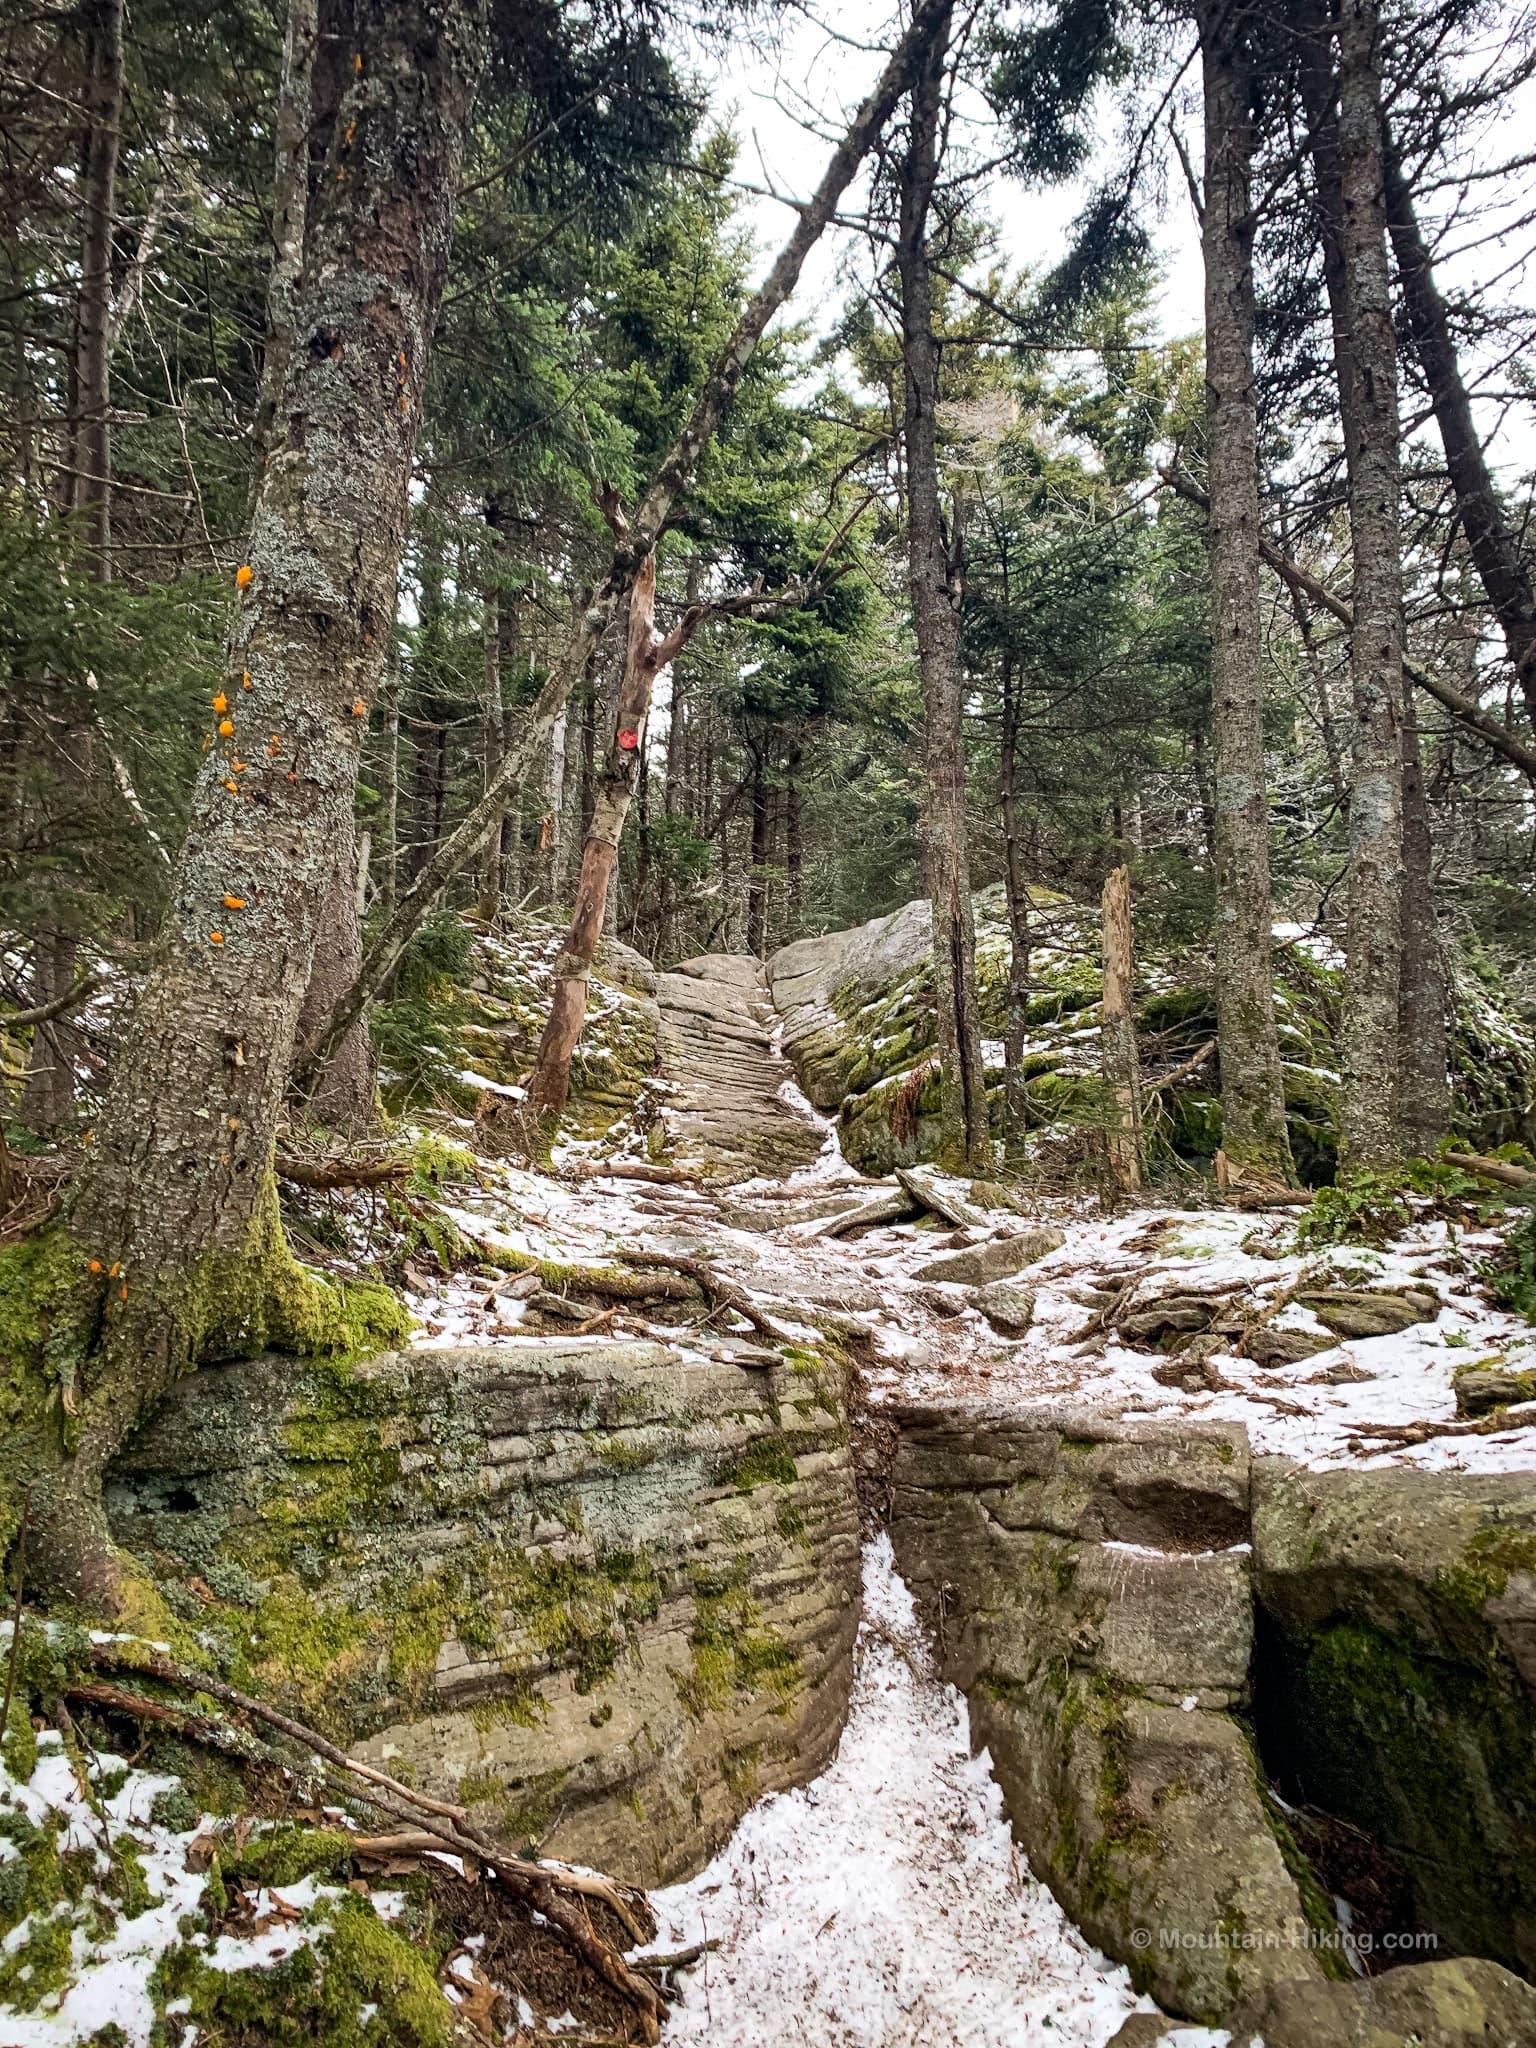 small rock ledge on mountain ridge